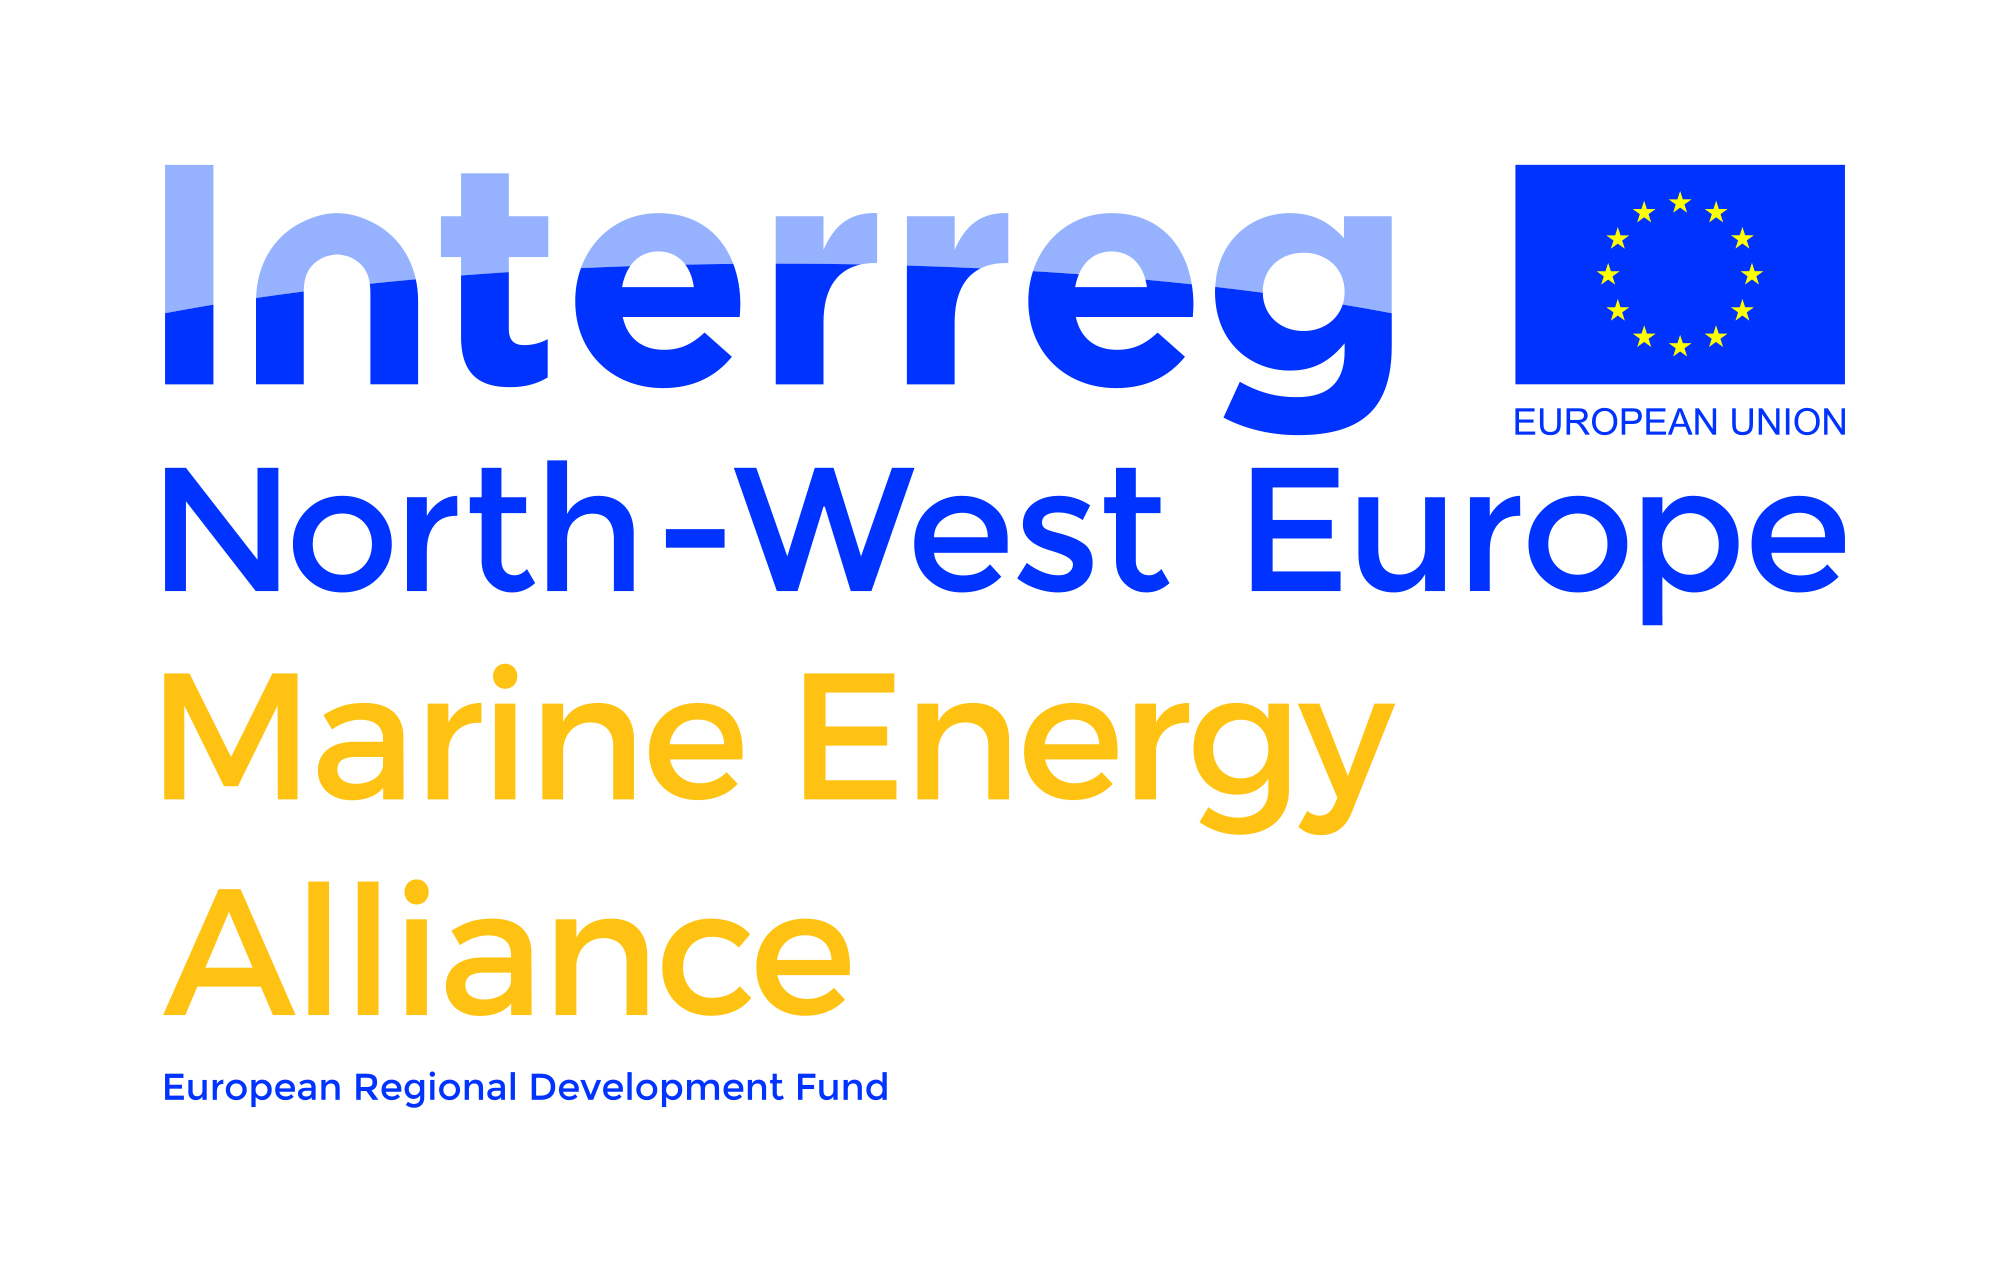 Marine Energy Alliance (MEA)